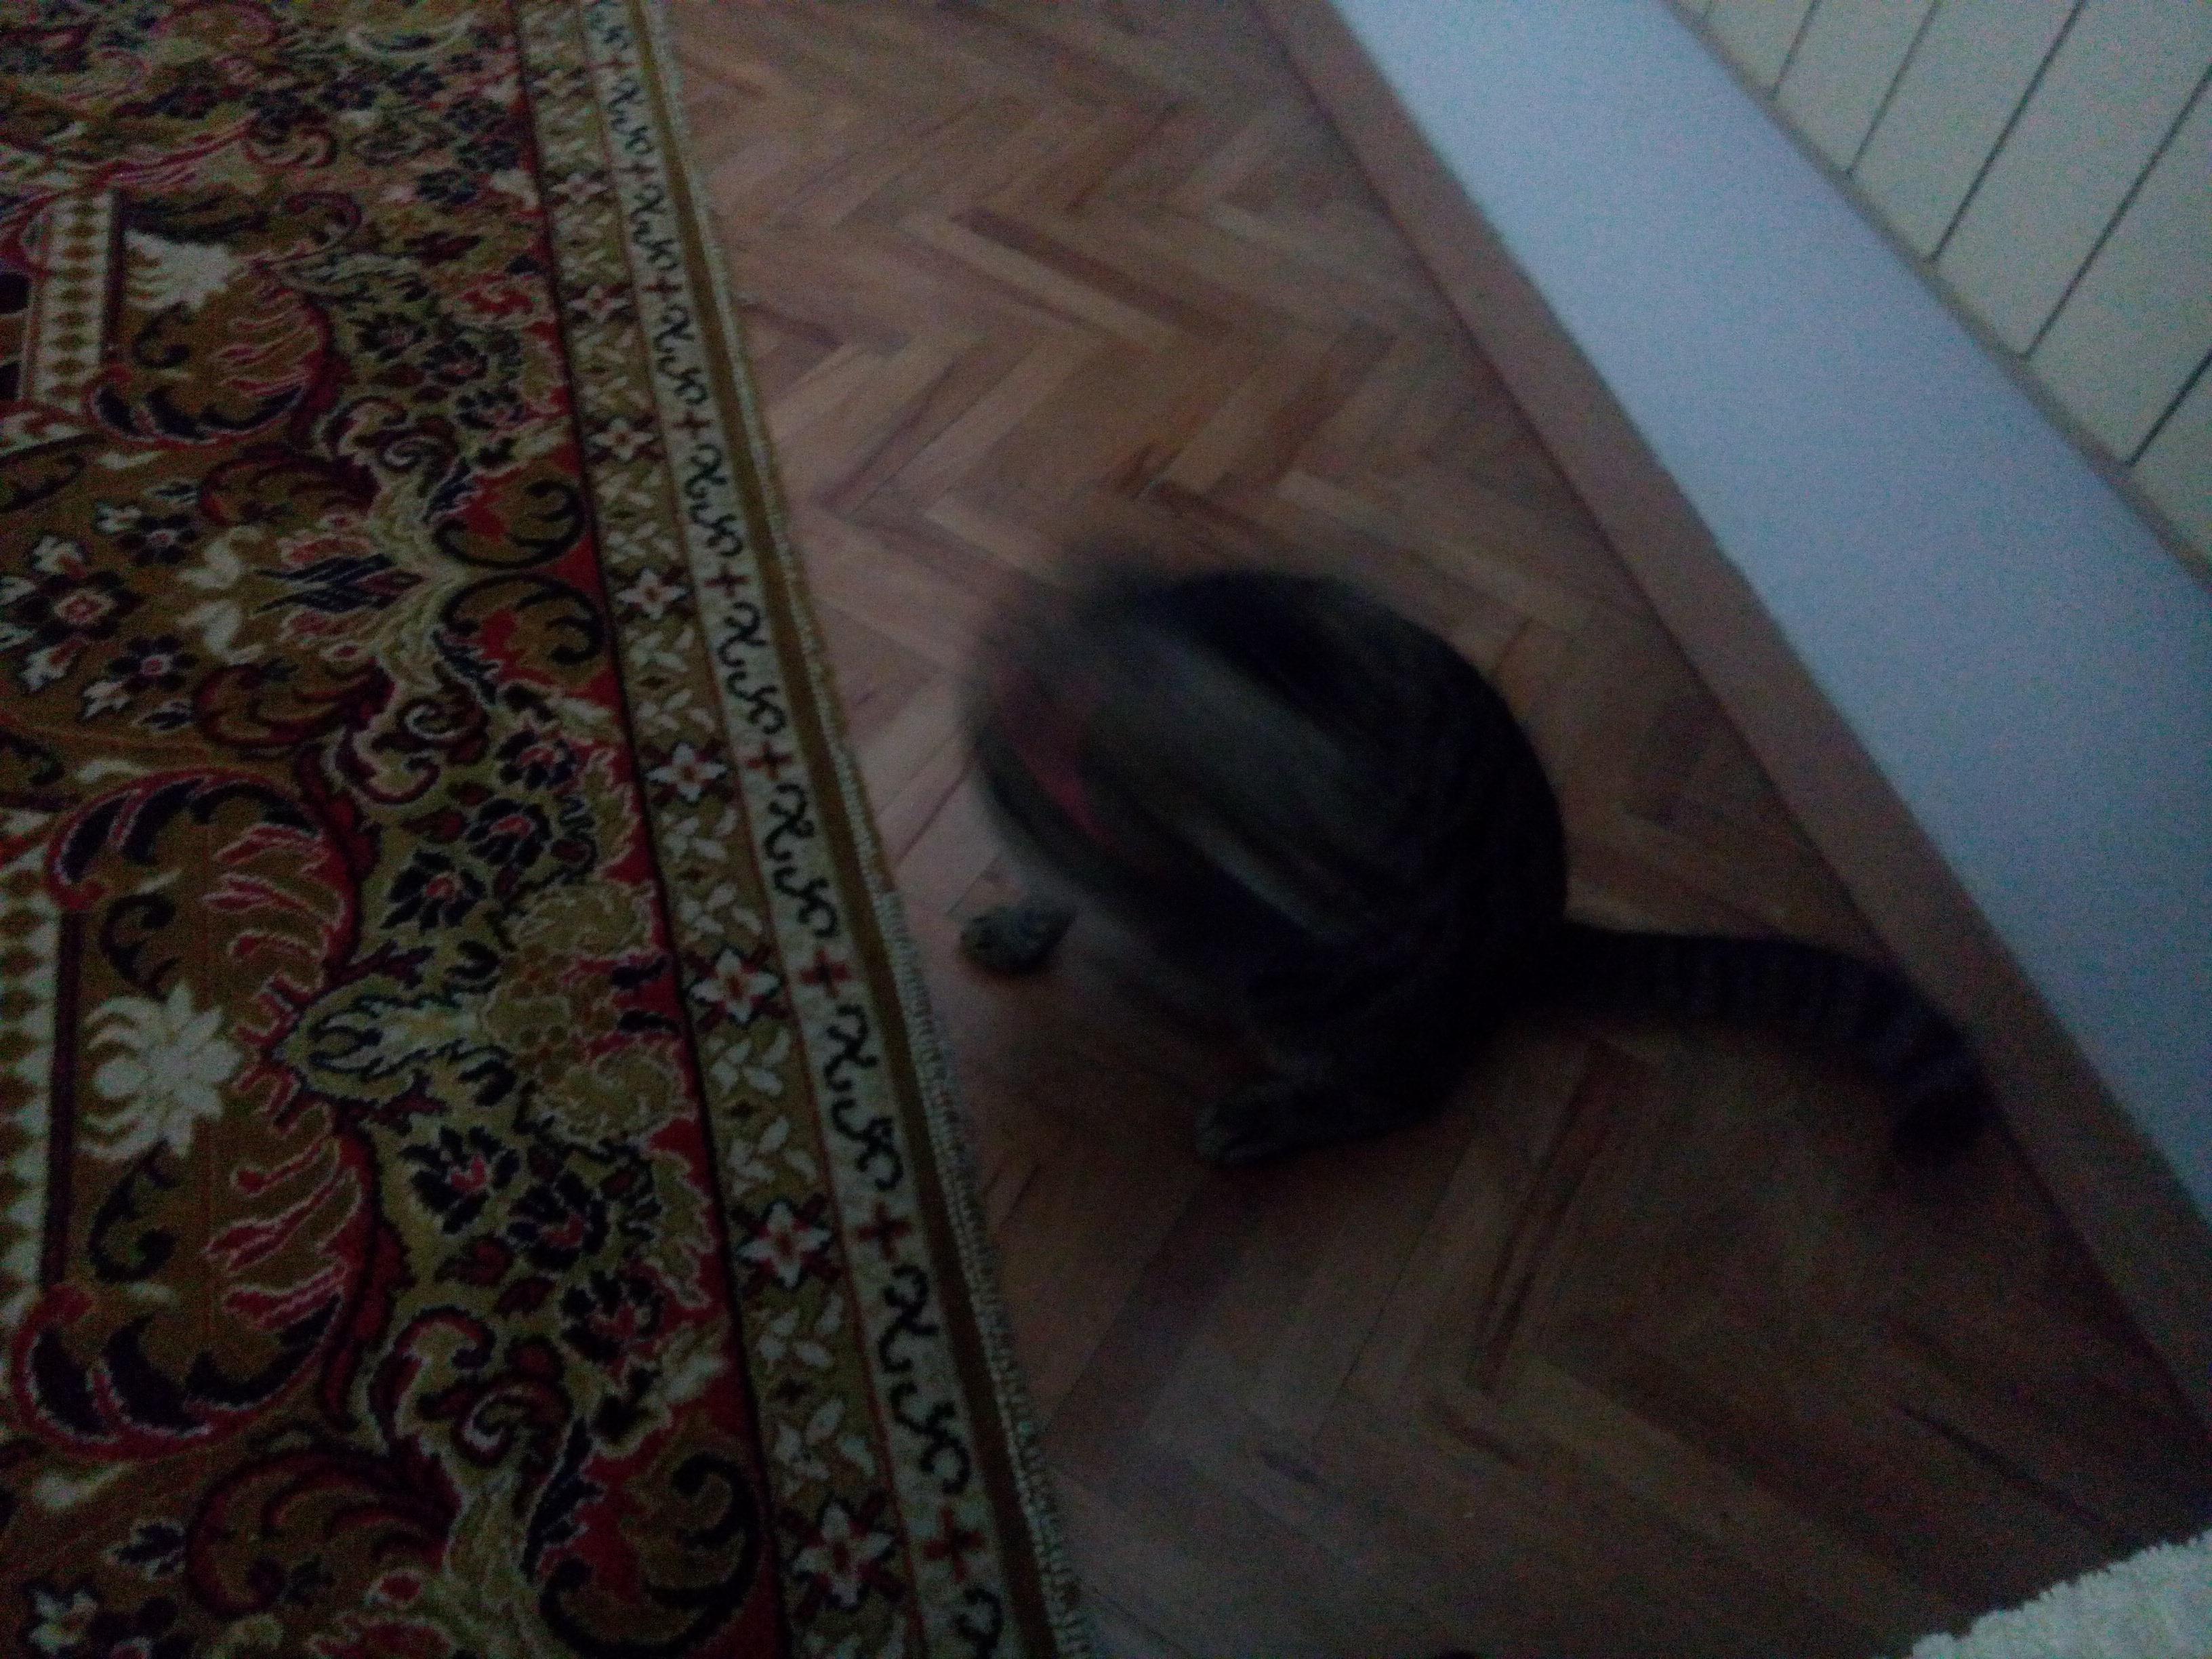 https://i.amy.gy/2017-sarajevo/IMG_20171005_172105.jpg